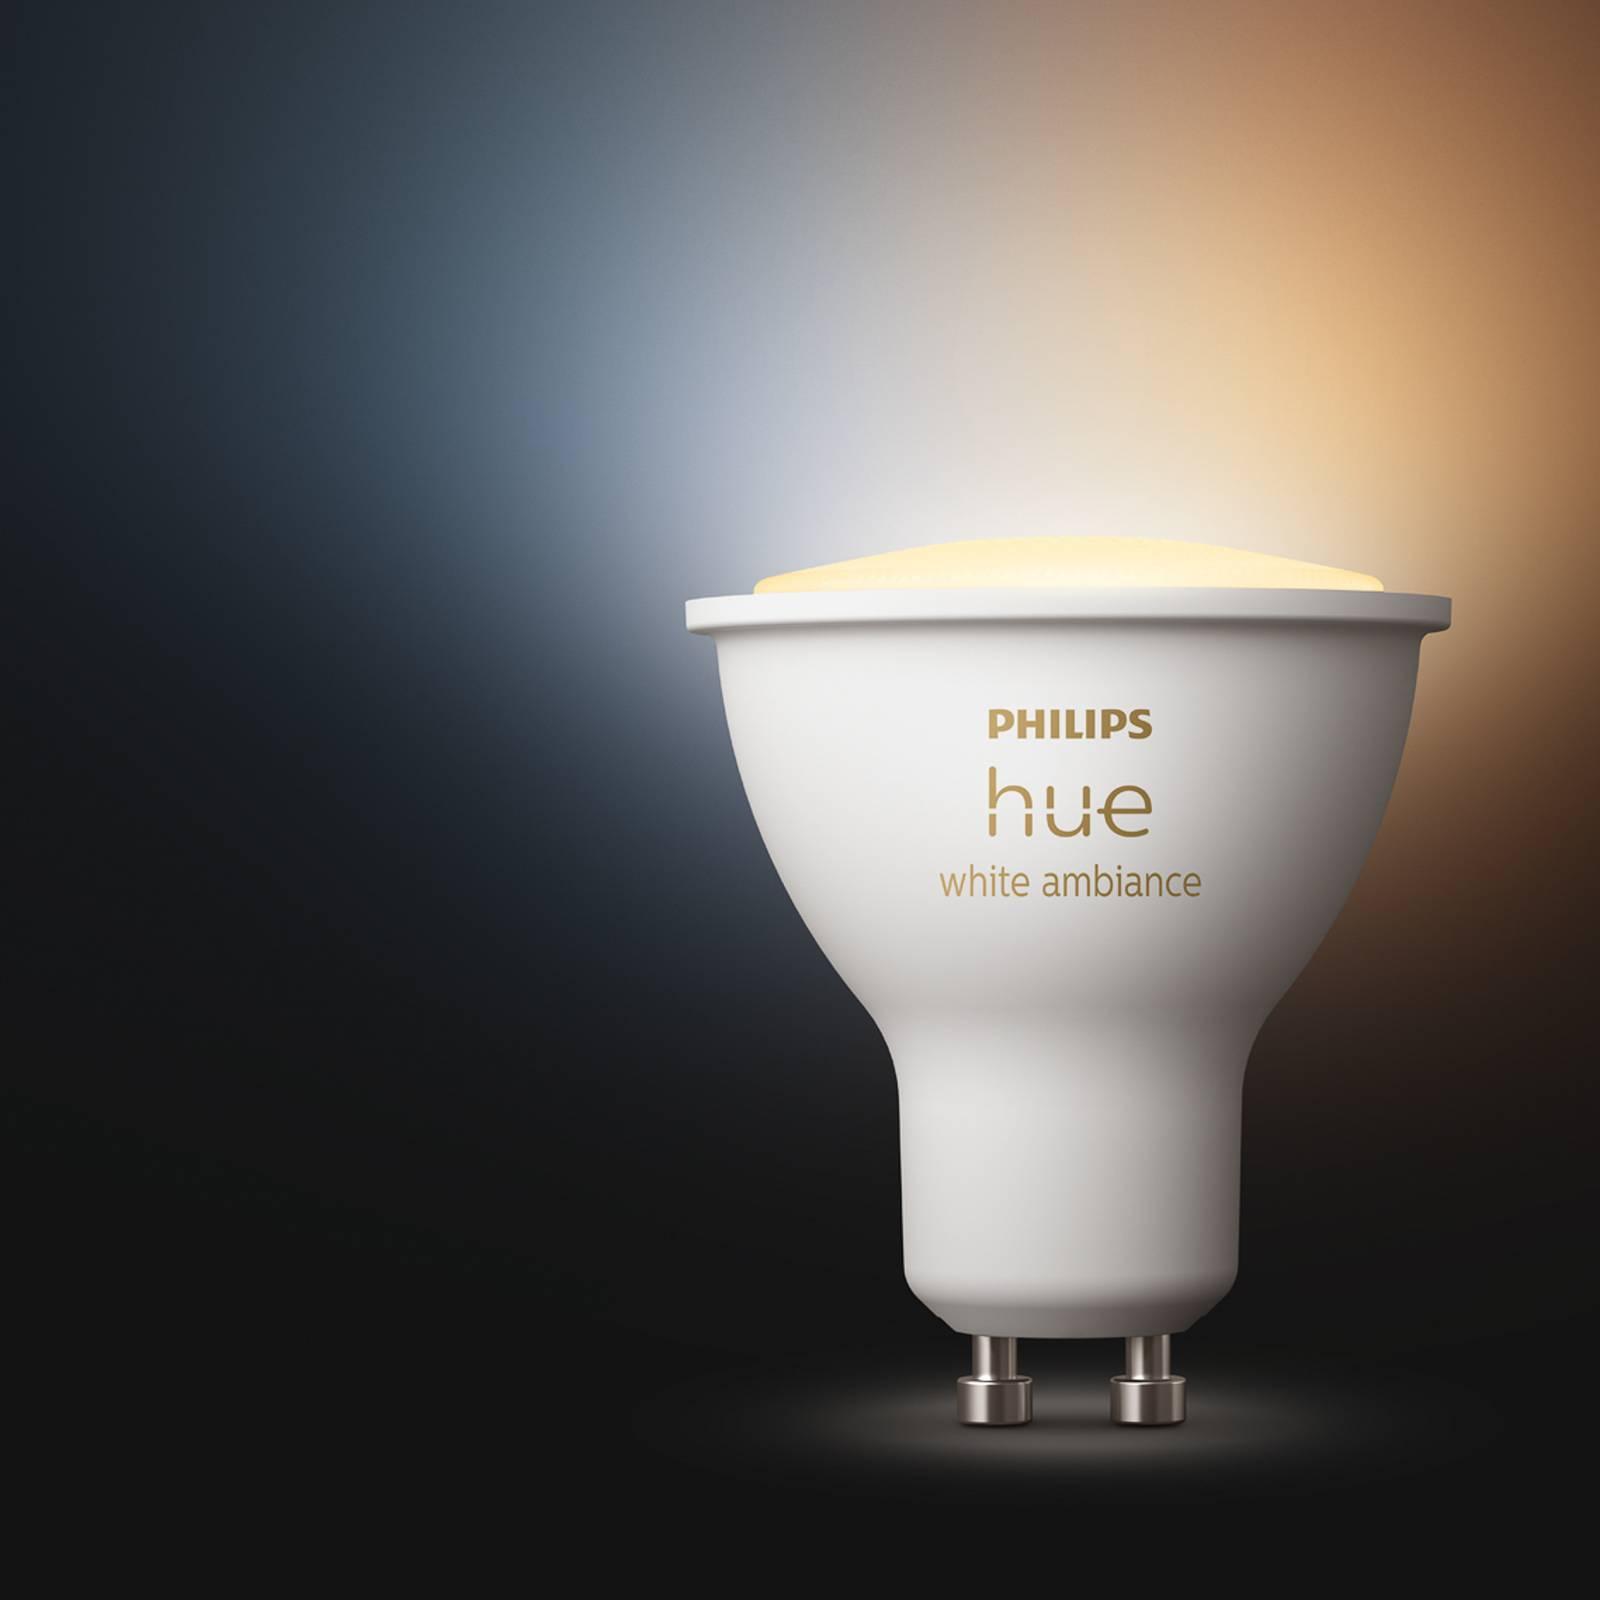 Philips Hue White Ambiance 5 W GU10-LED-lamppu